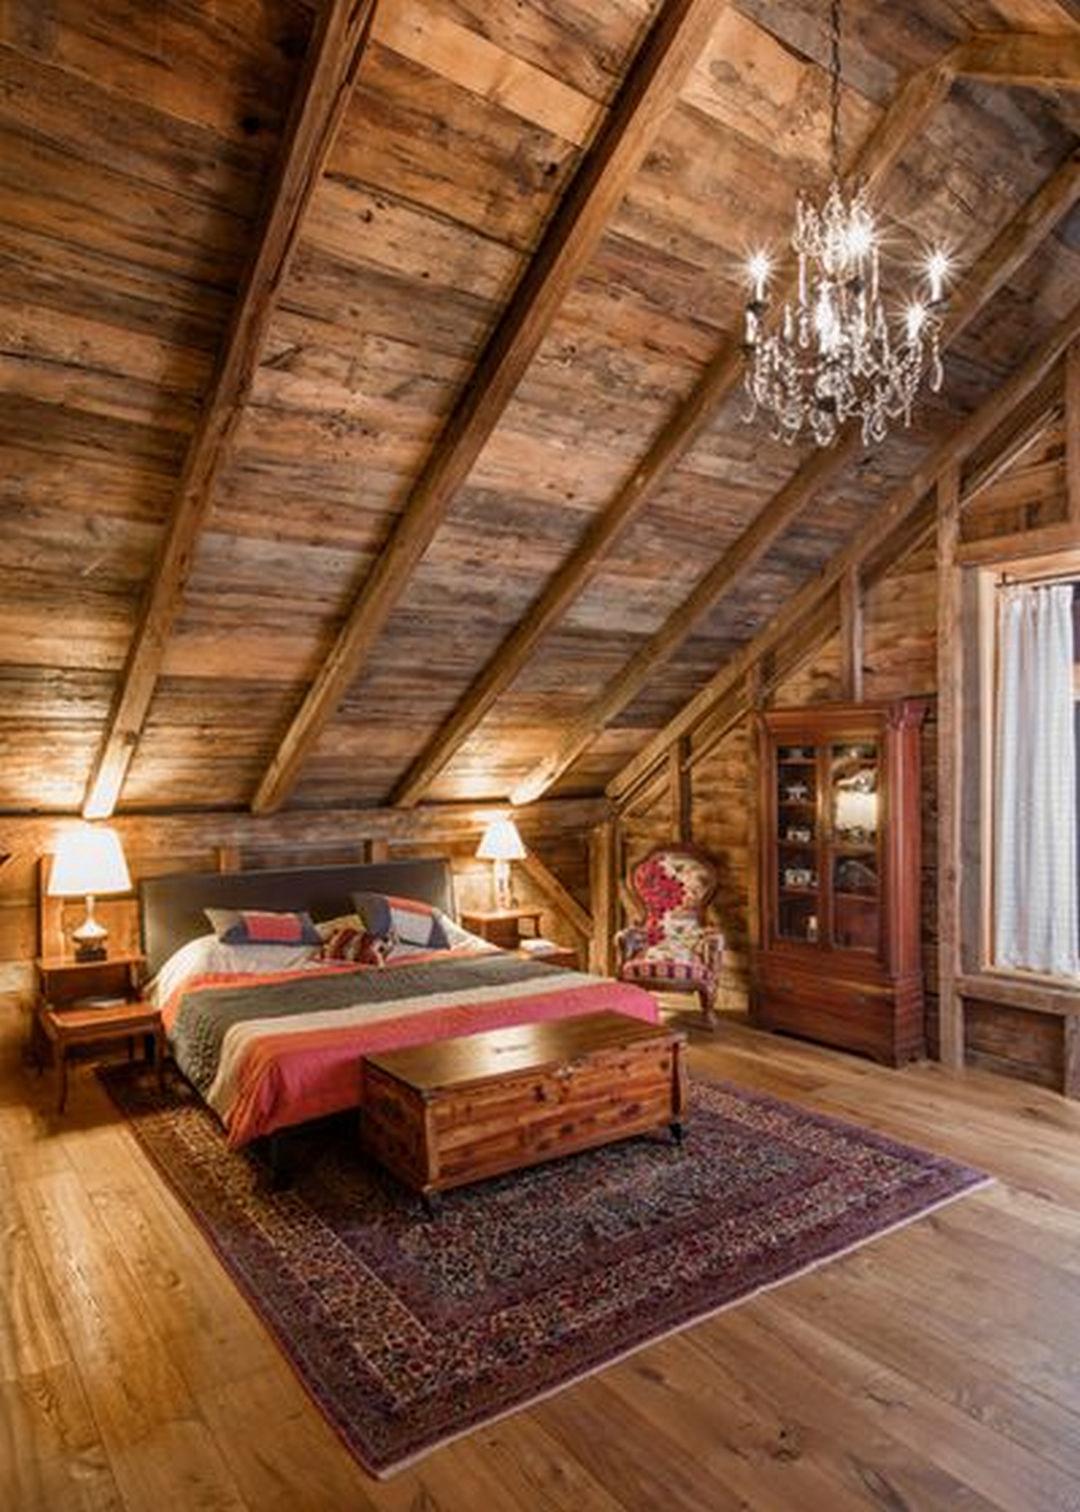 30 Rustic Chalet Interior Design Ideas: Gorgeous Rustic Cabin Interior Idea (14) - Futurist Architecture